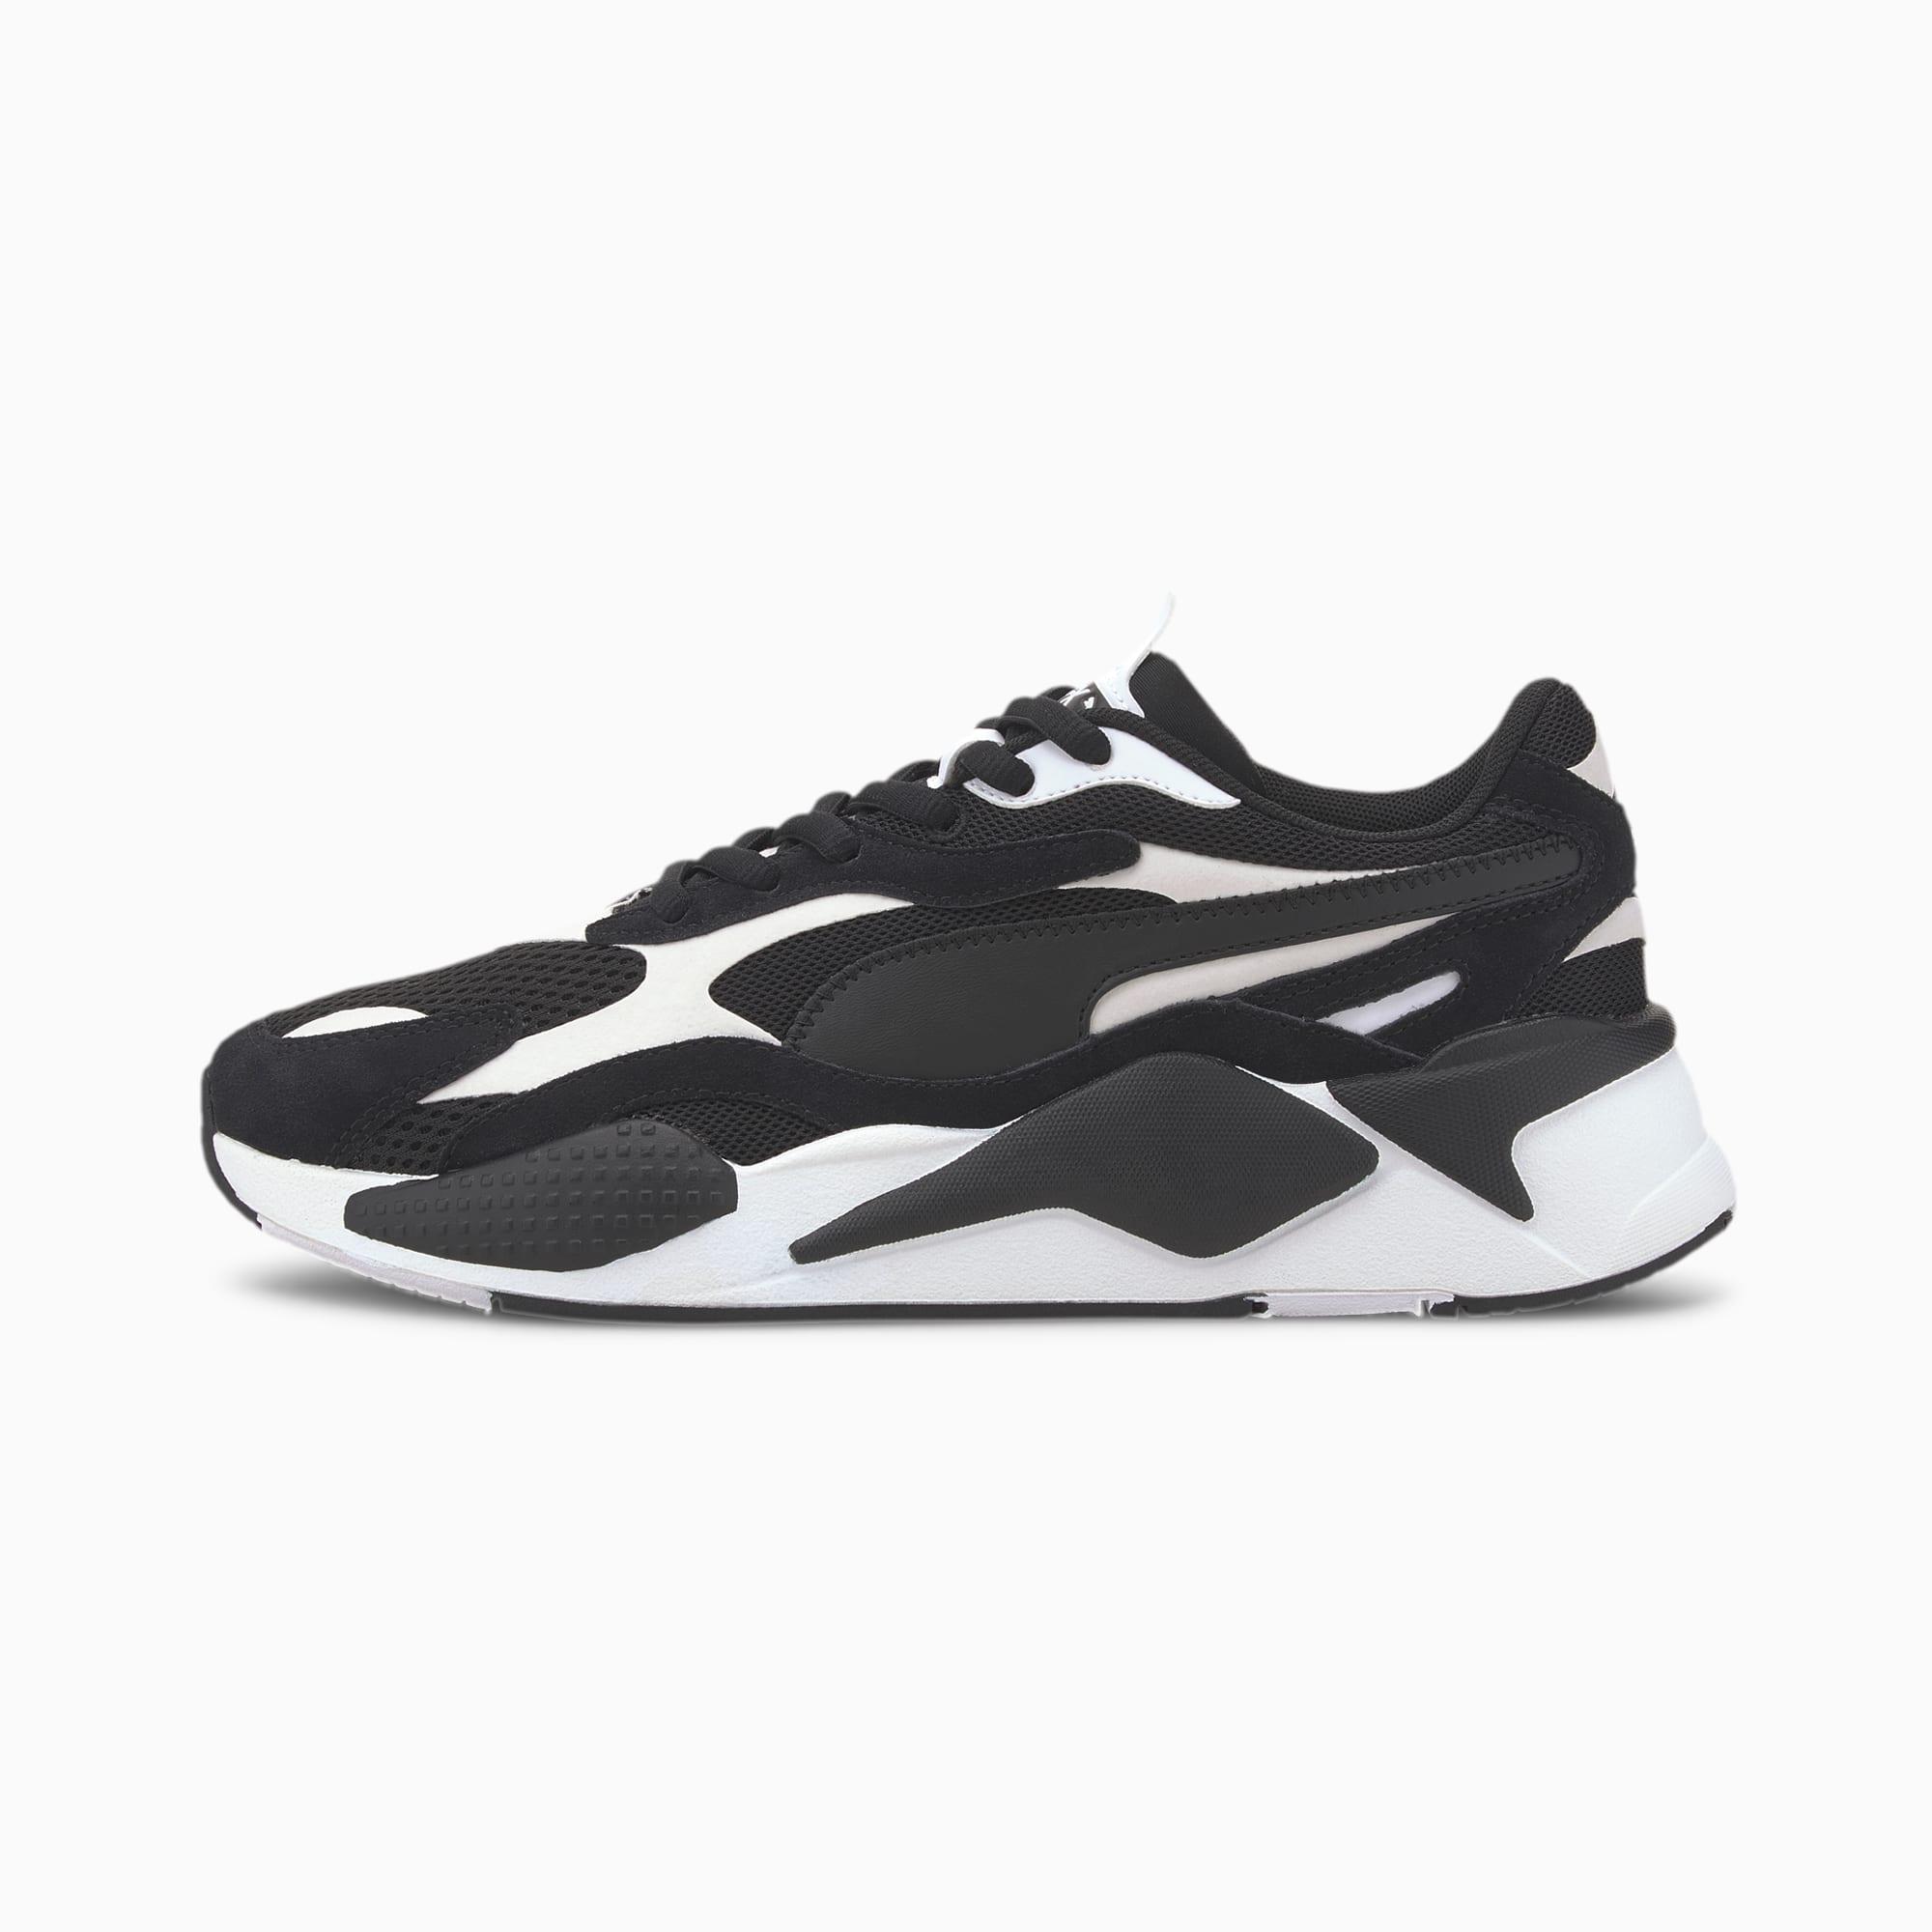 Zapatos deportivos RS-X³ Super para hombre